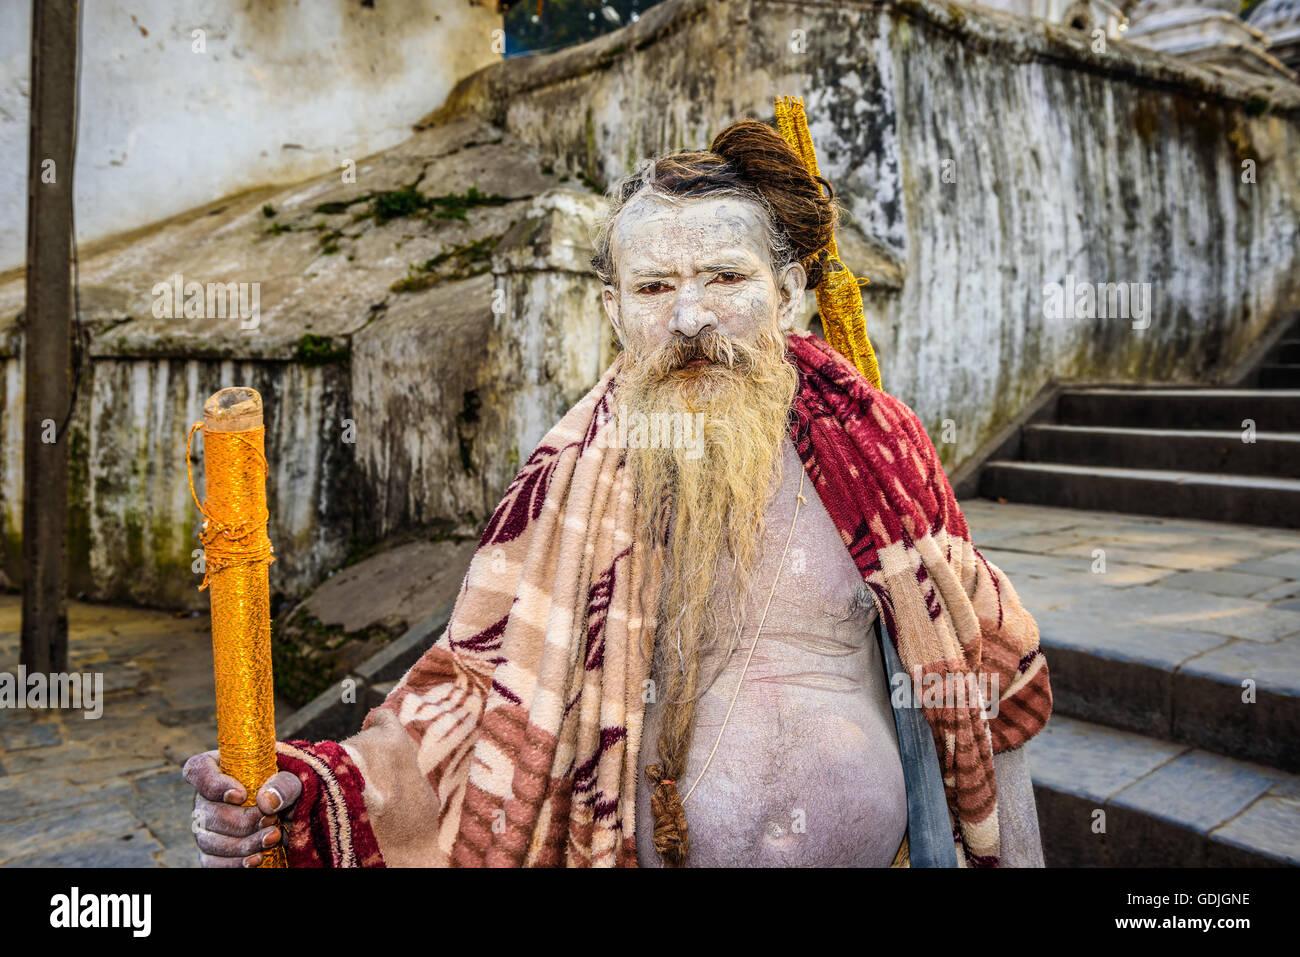 Portrait of wandering  Shaiva sadhu (holy man) with white face painting in ancient Pashupatinath Temple, Kathmandu, - Stock Image